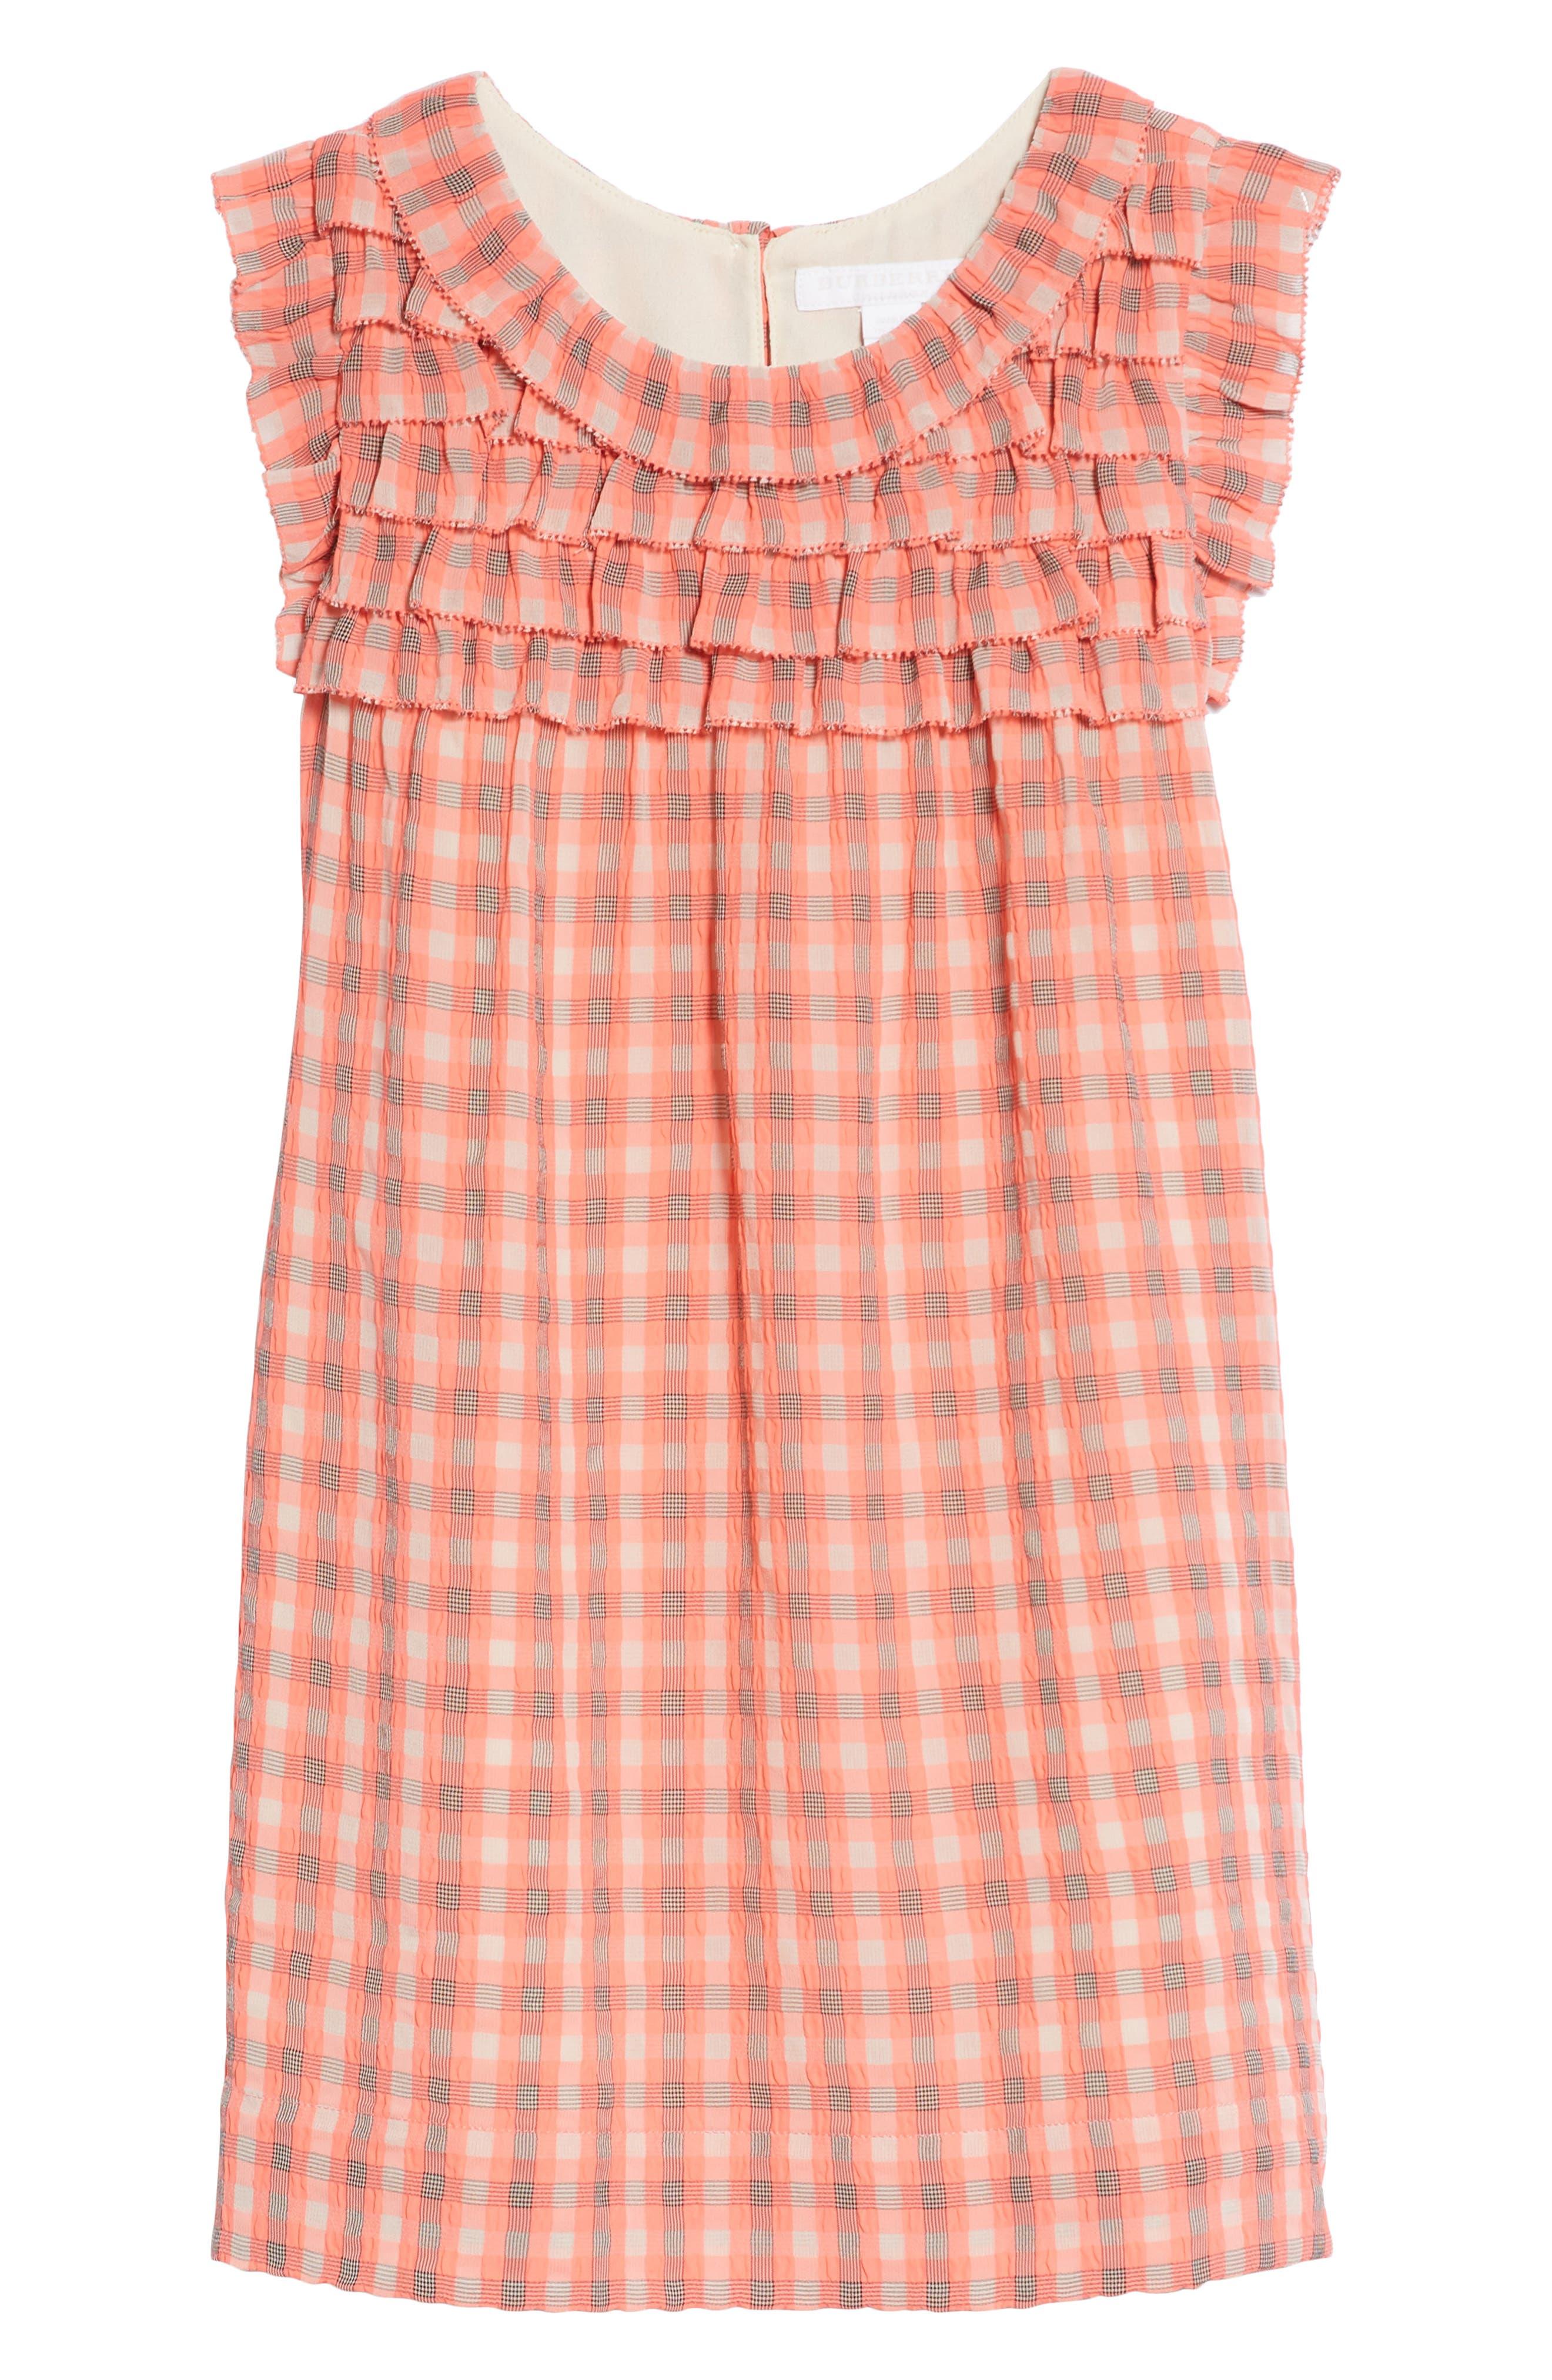 Burberry Magnoly Check Ruffle Dress (Little Girls & Big Girls)